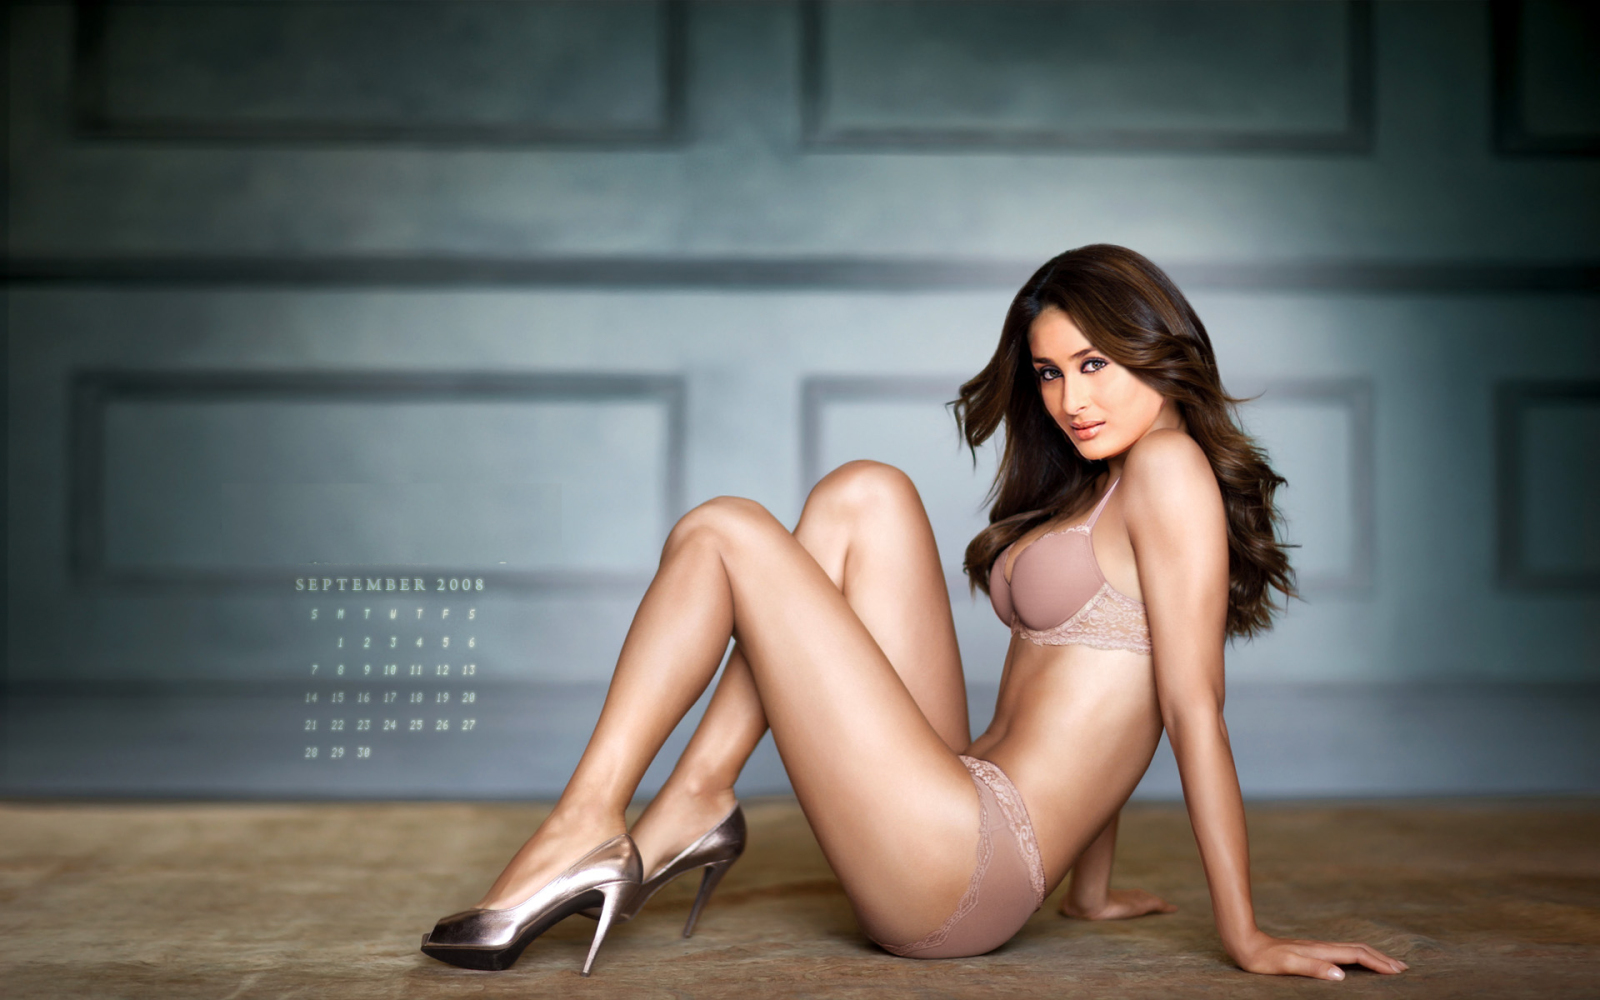 http://4.bp.blogspot.com/-pTBRT0uj318/UGEVEIcjG3I/AAAAAAAAB78/hNj93Z-Ndys/s1600/kareena-kapoor-lingerie-Bikini-wallpaper+%5Bshoutingblogger.blogspot.Com%5D.jpg